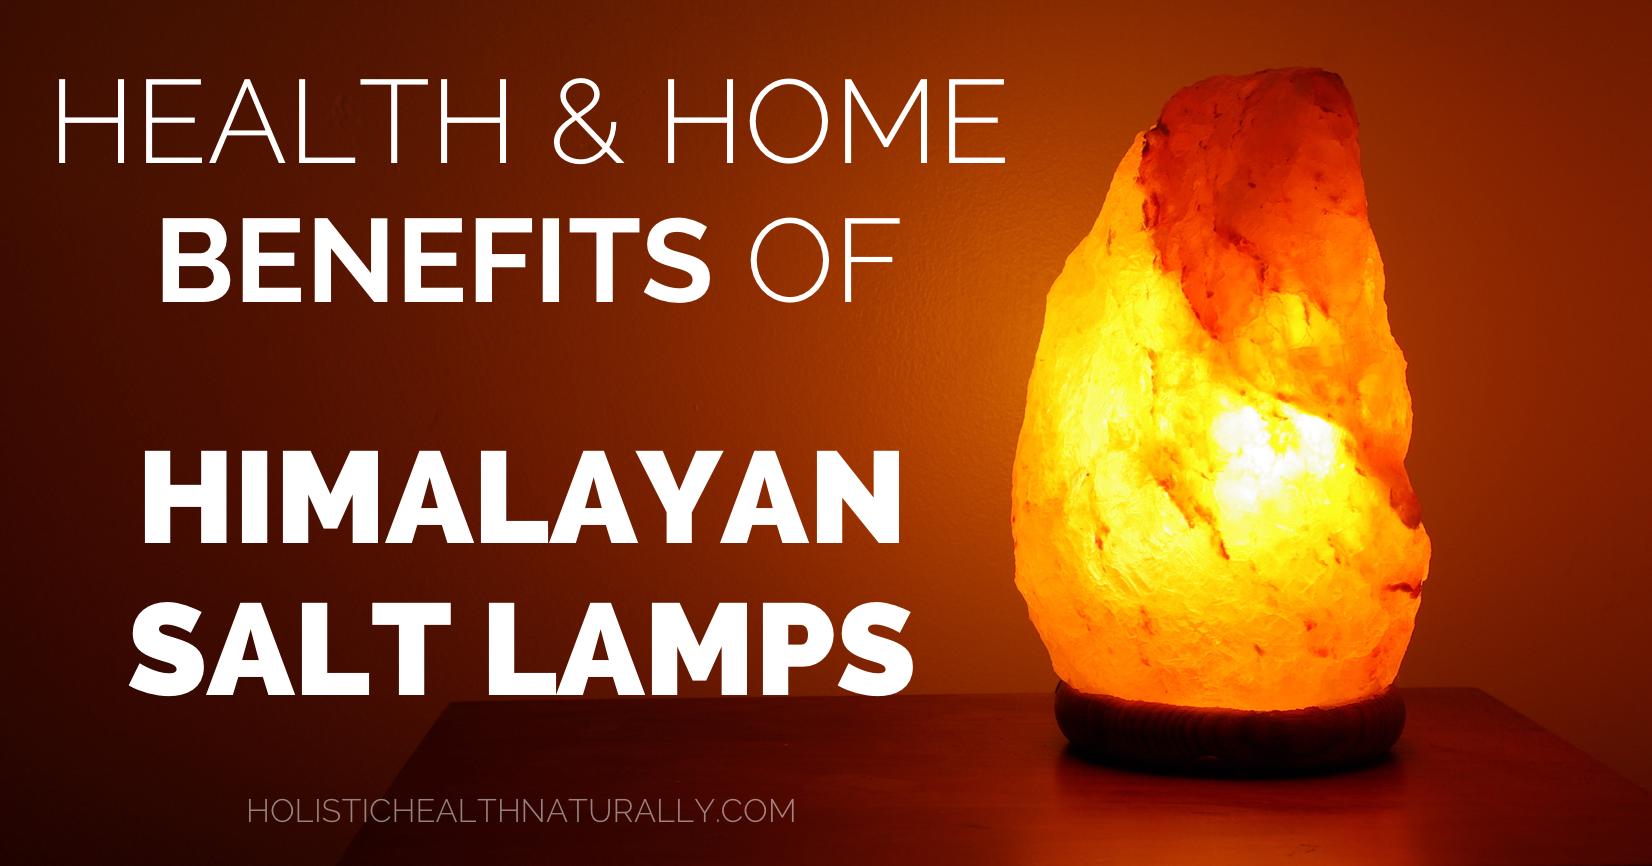 Health Benefits Of Salt Lamps Health & Home Benefits Of Himalayan Salt Lamps